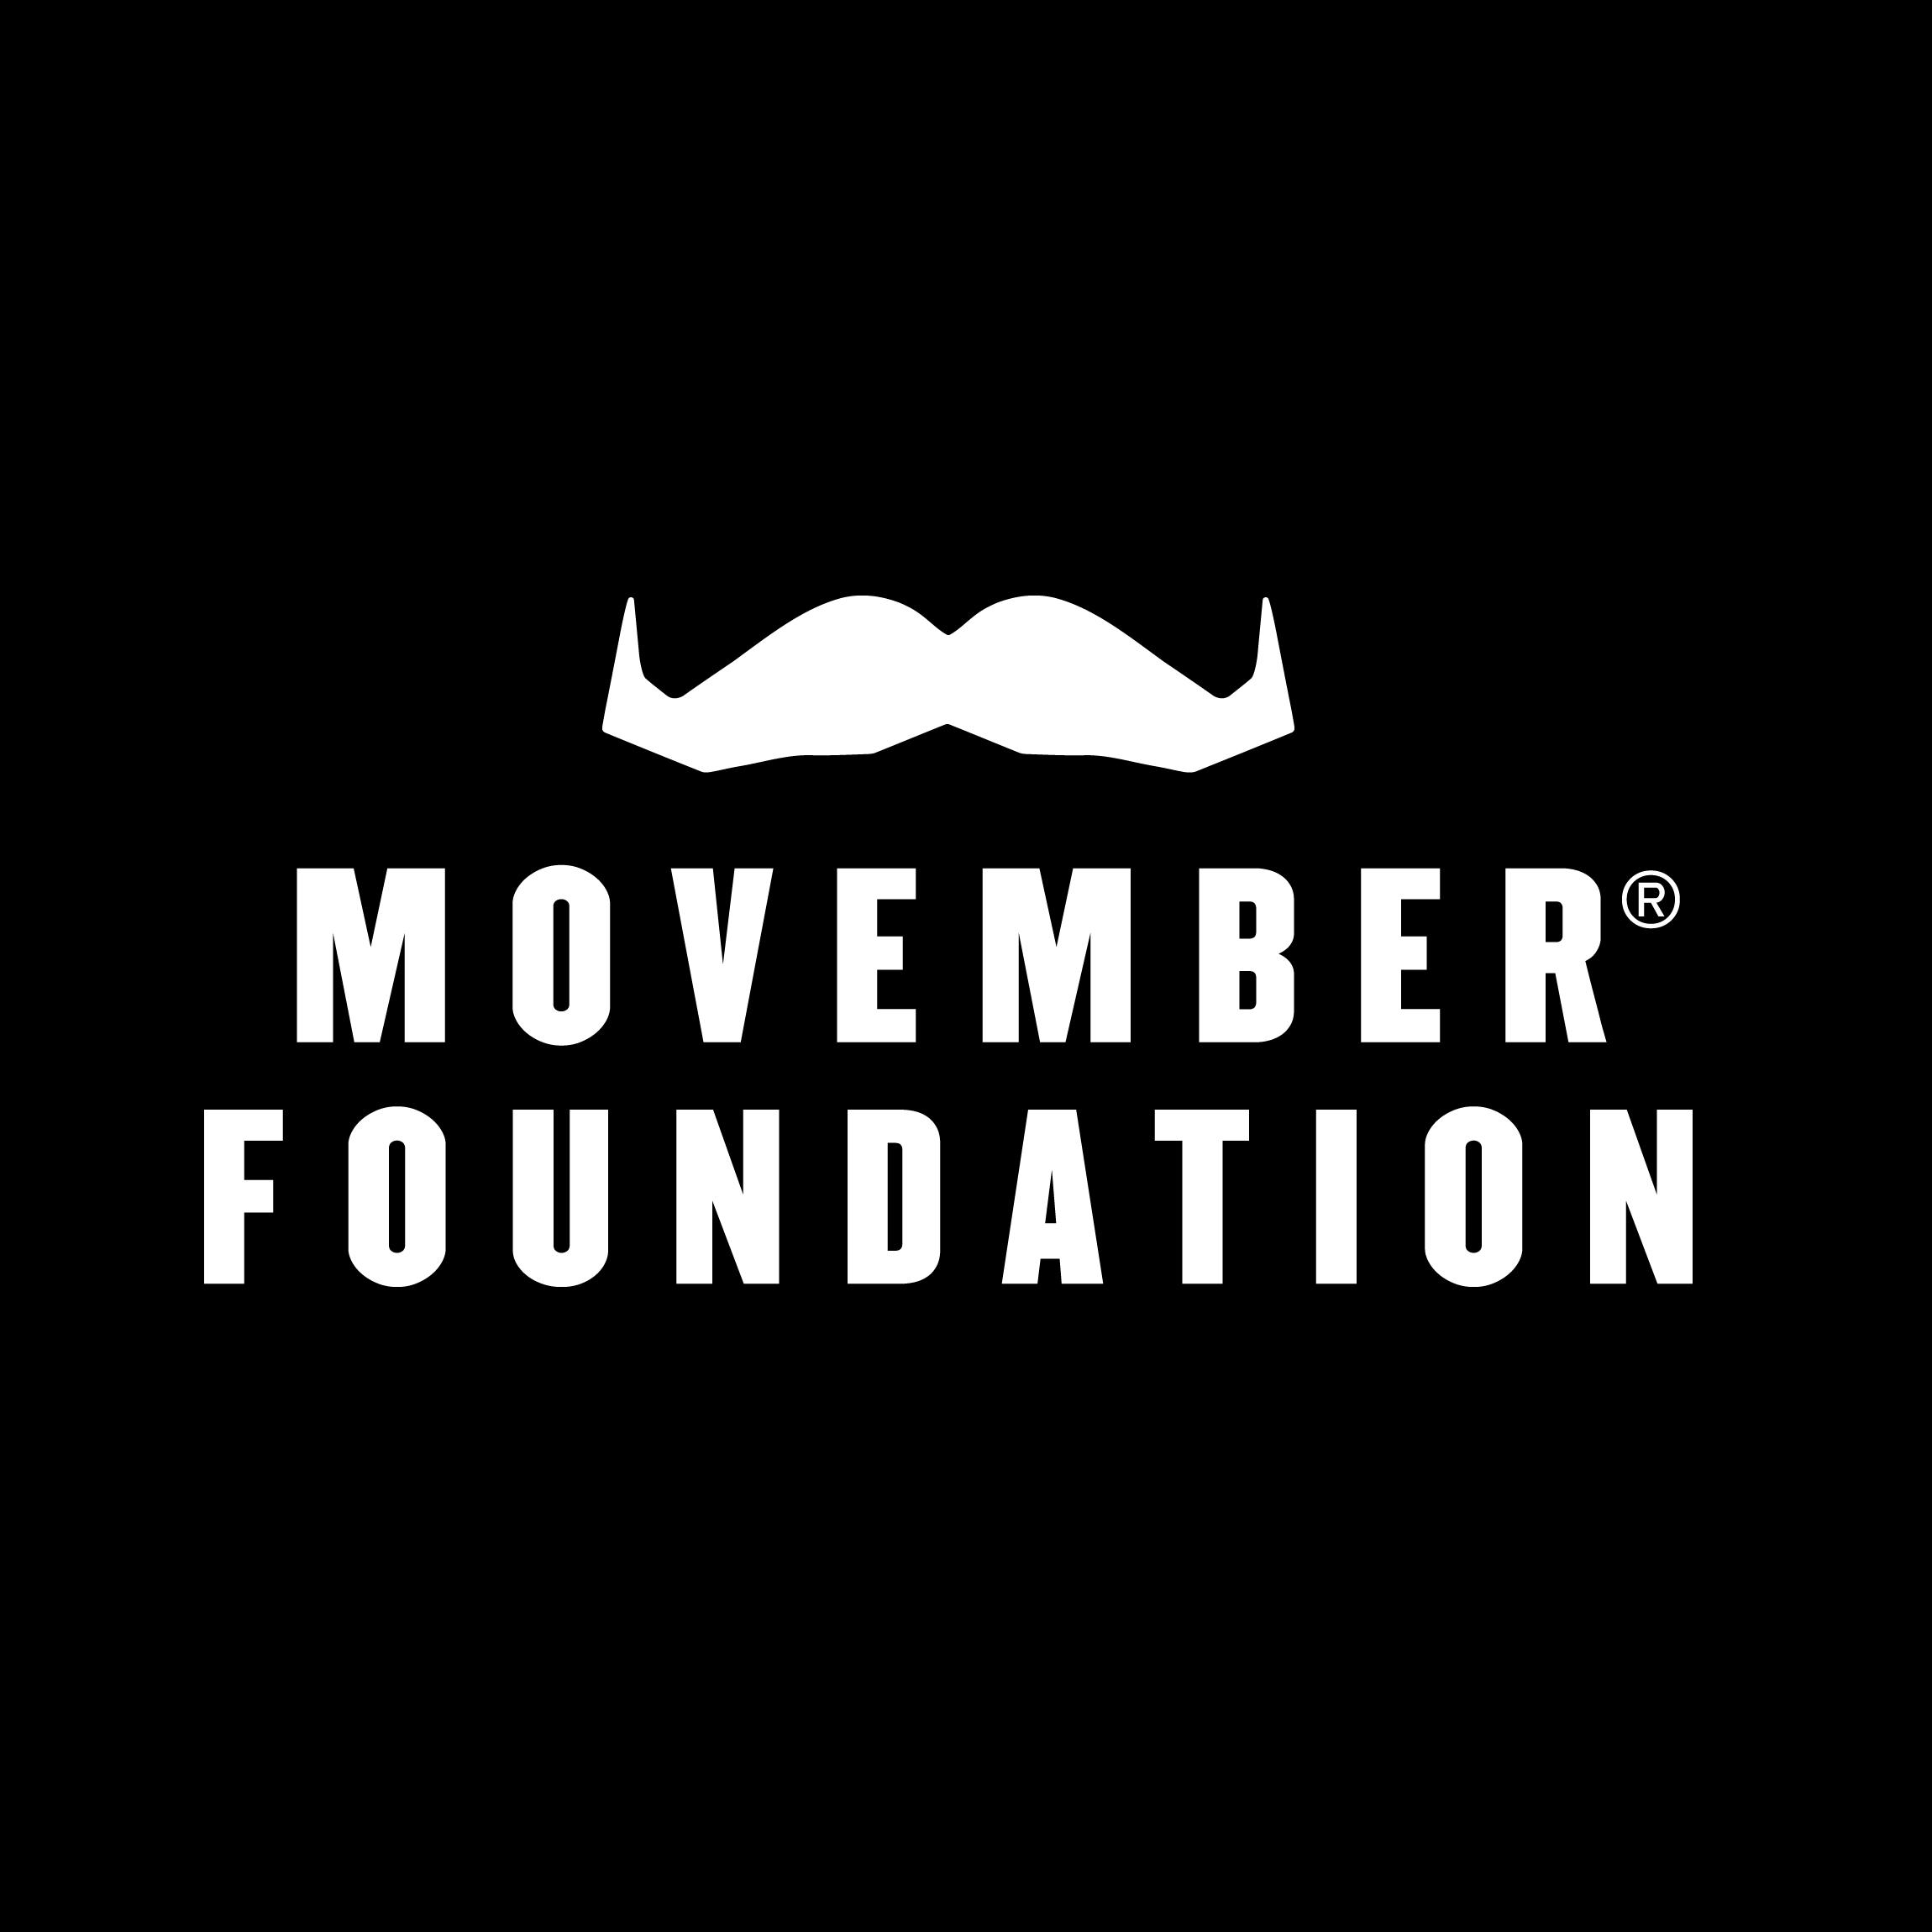 Fondation Movember